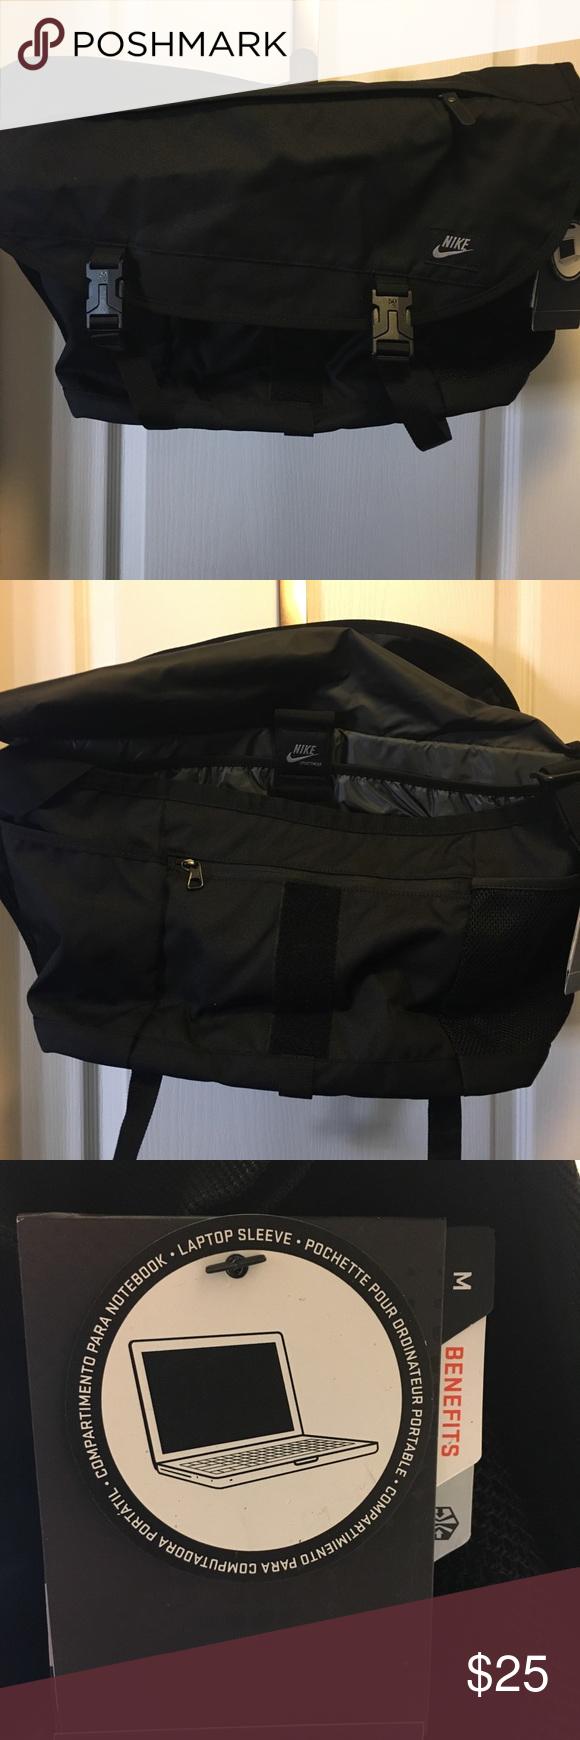 f442d708037c NWT Nike Messenger Computer Bag NWT Nike Messenger Computer bag. Over the  shoulder strap made